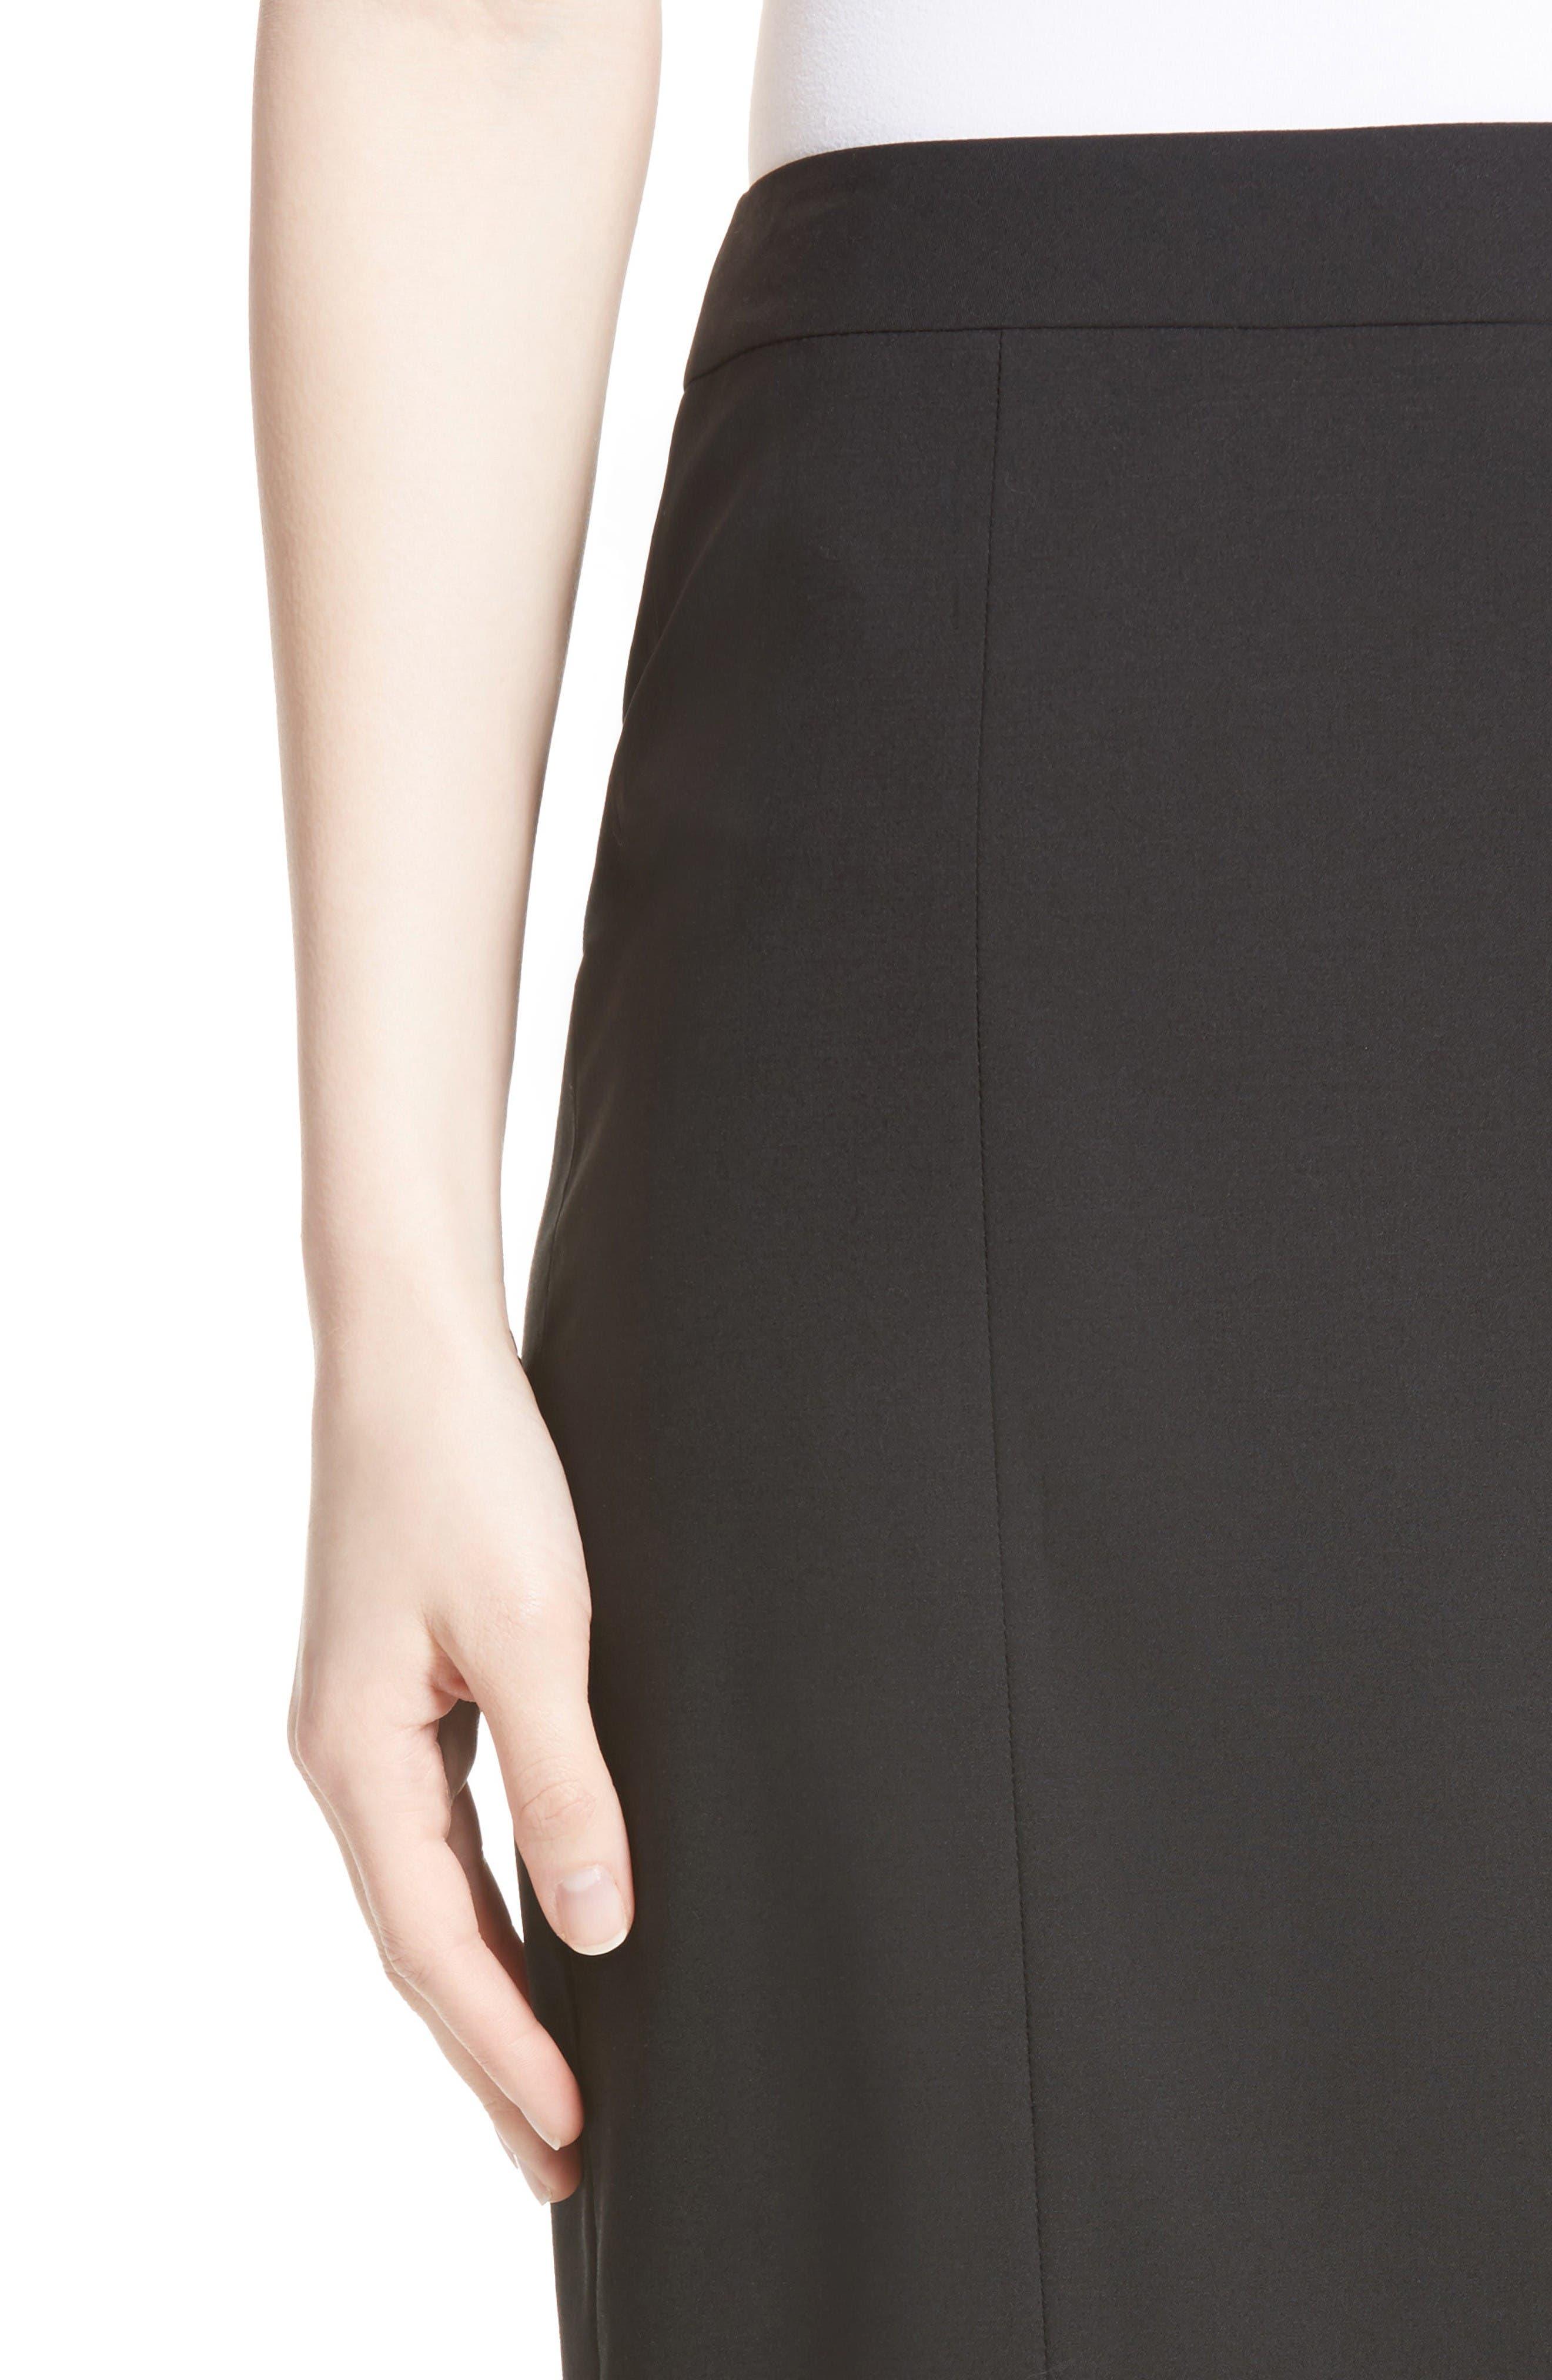 Stretch Wool Pencil Skirt,                             Alternate thumbnail 6, color,                             Black